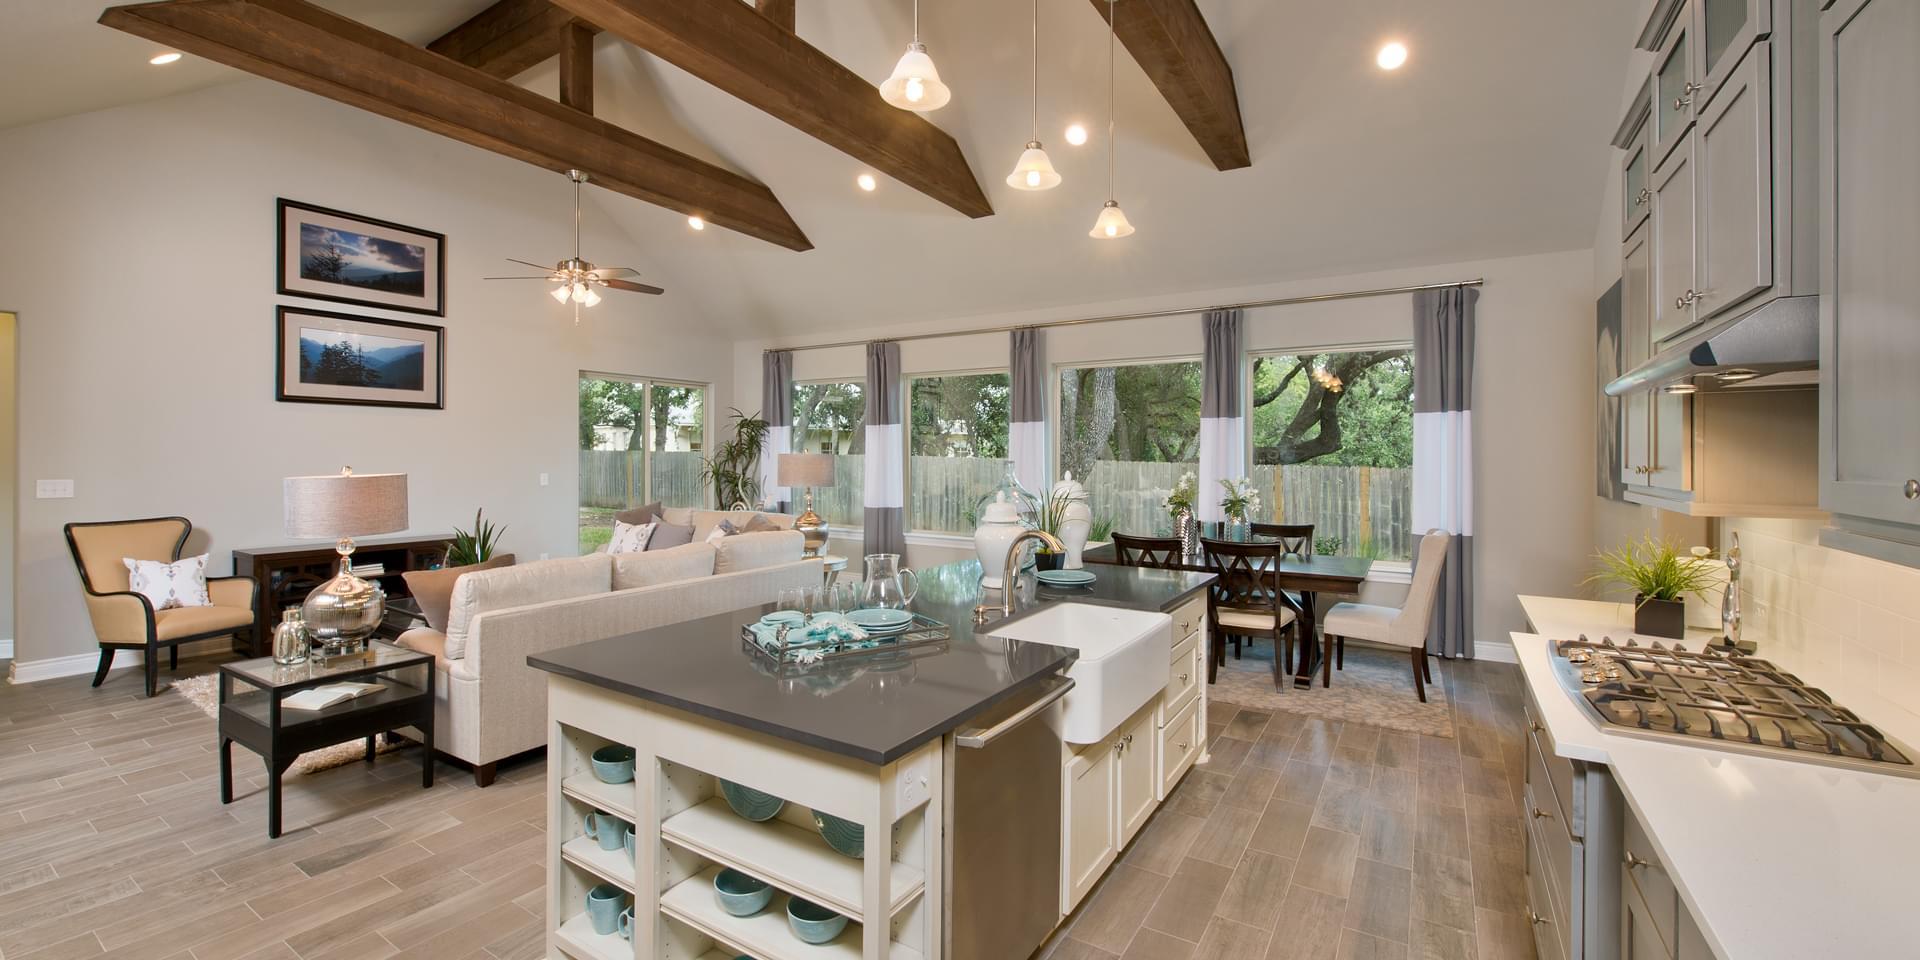 New Homes In Boerne Tx From Tilson Custom Home Builders